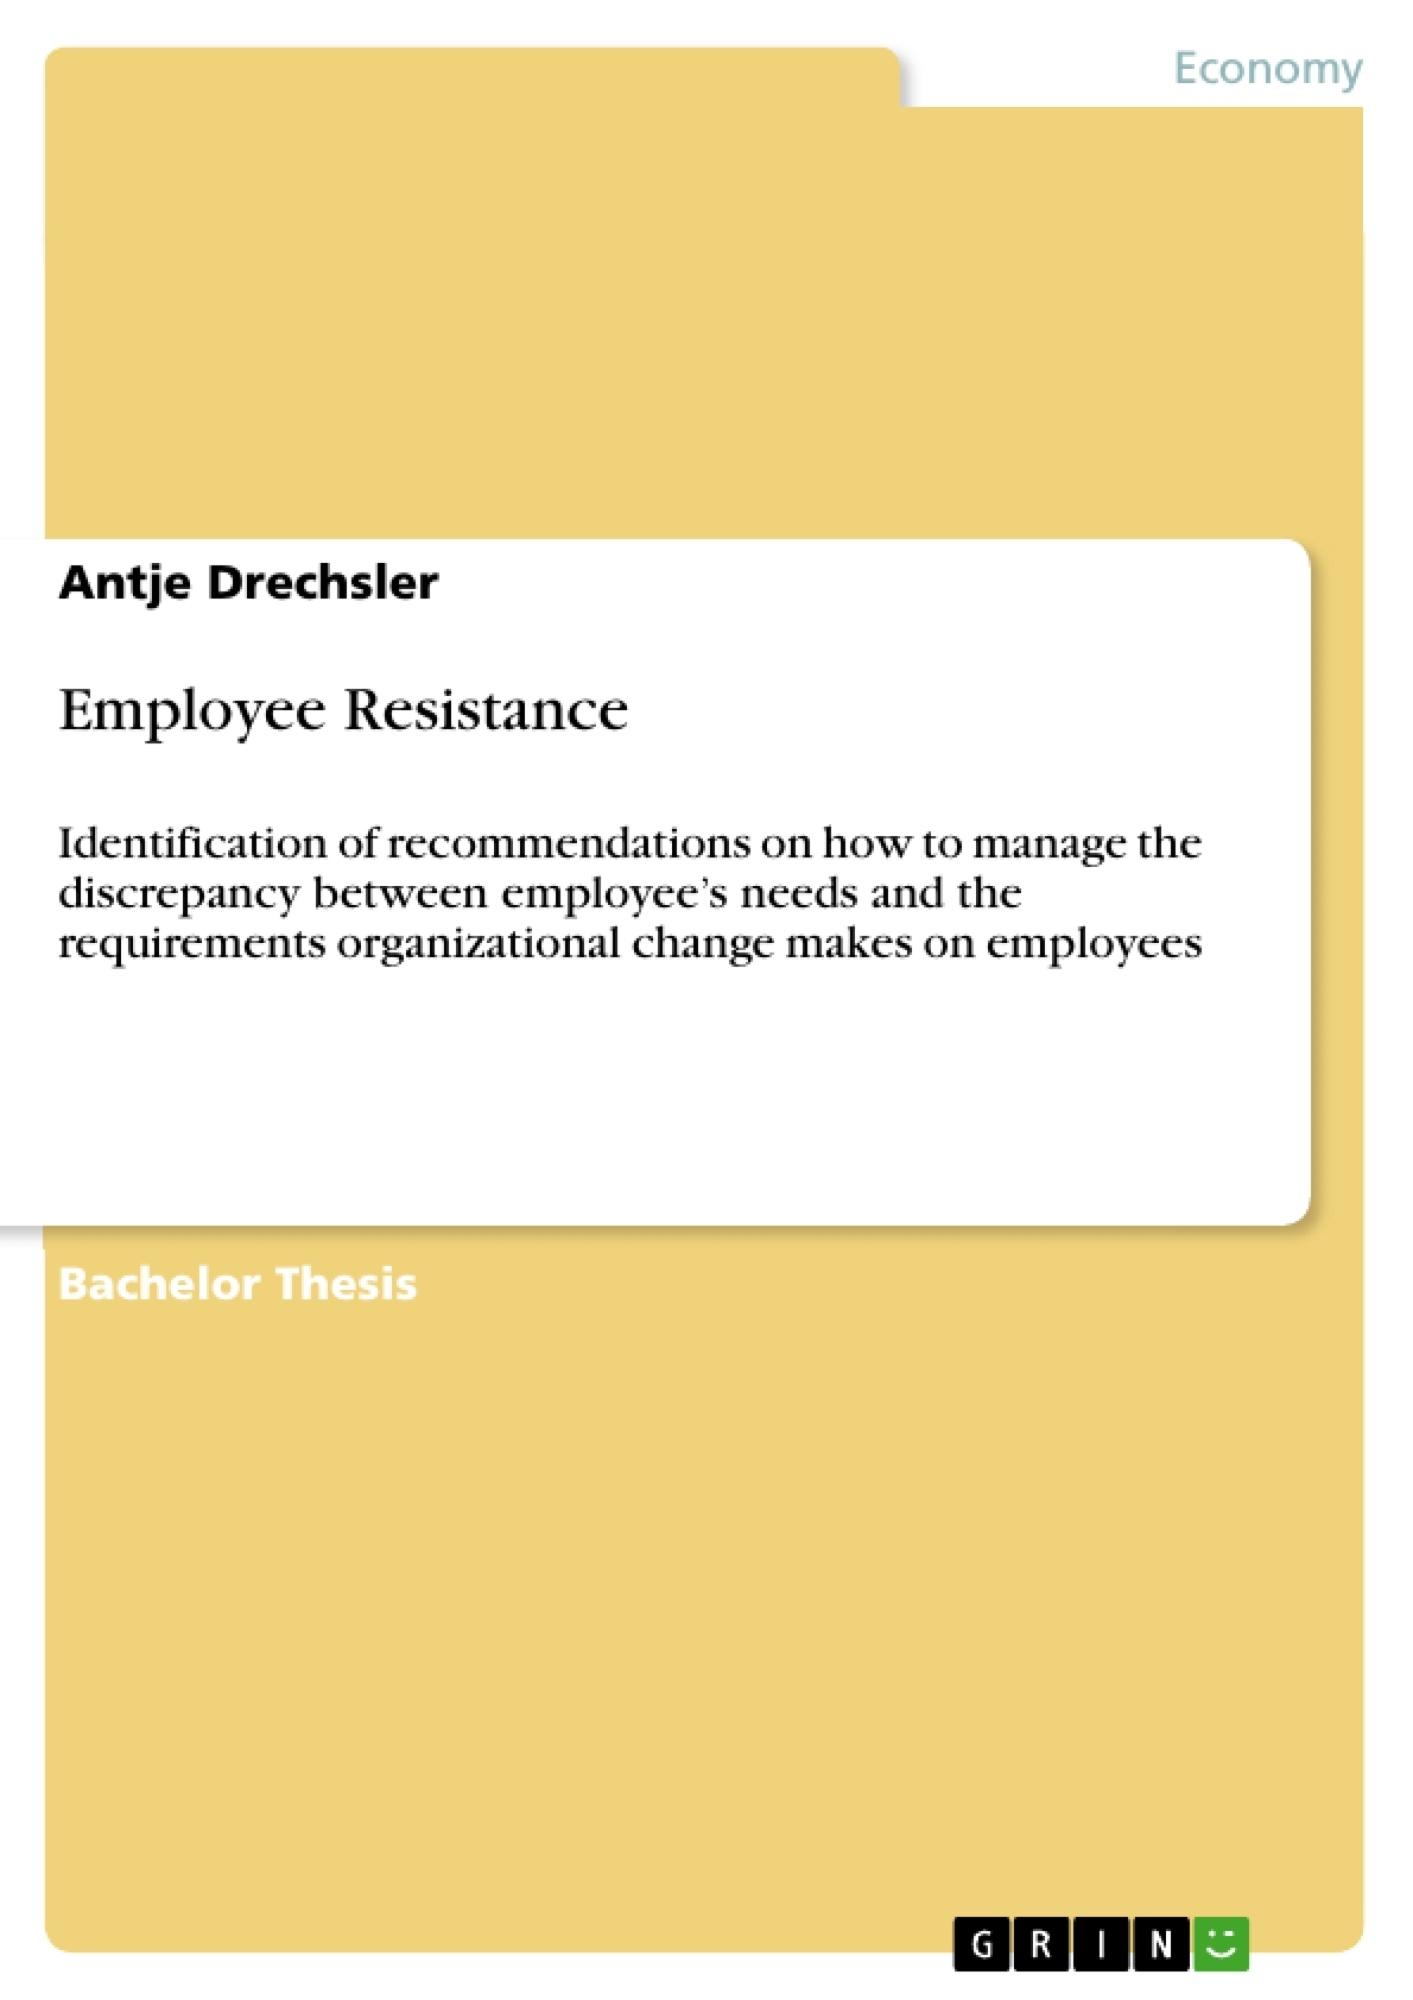 Title: Employee Resistance